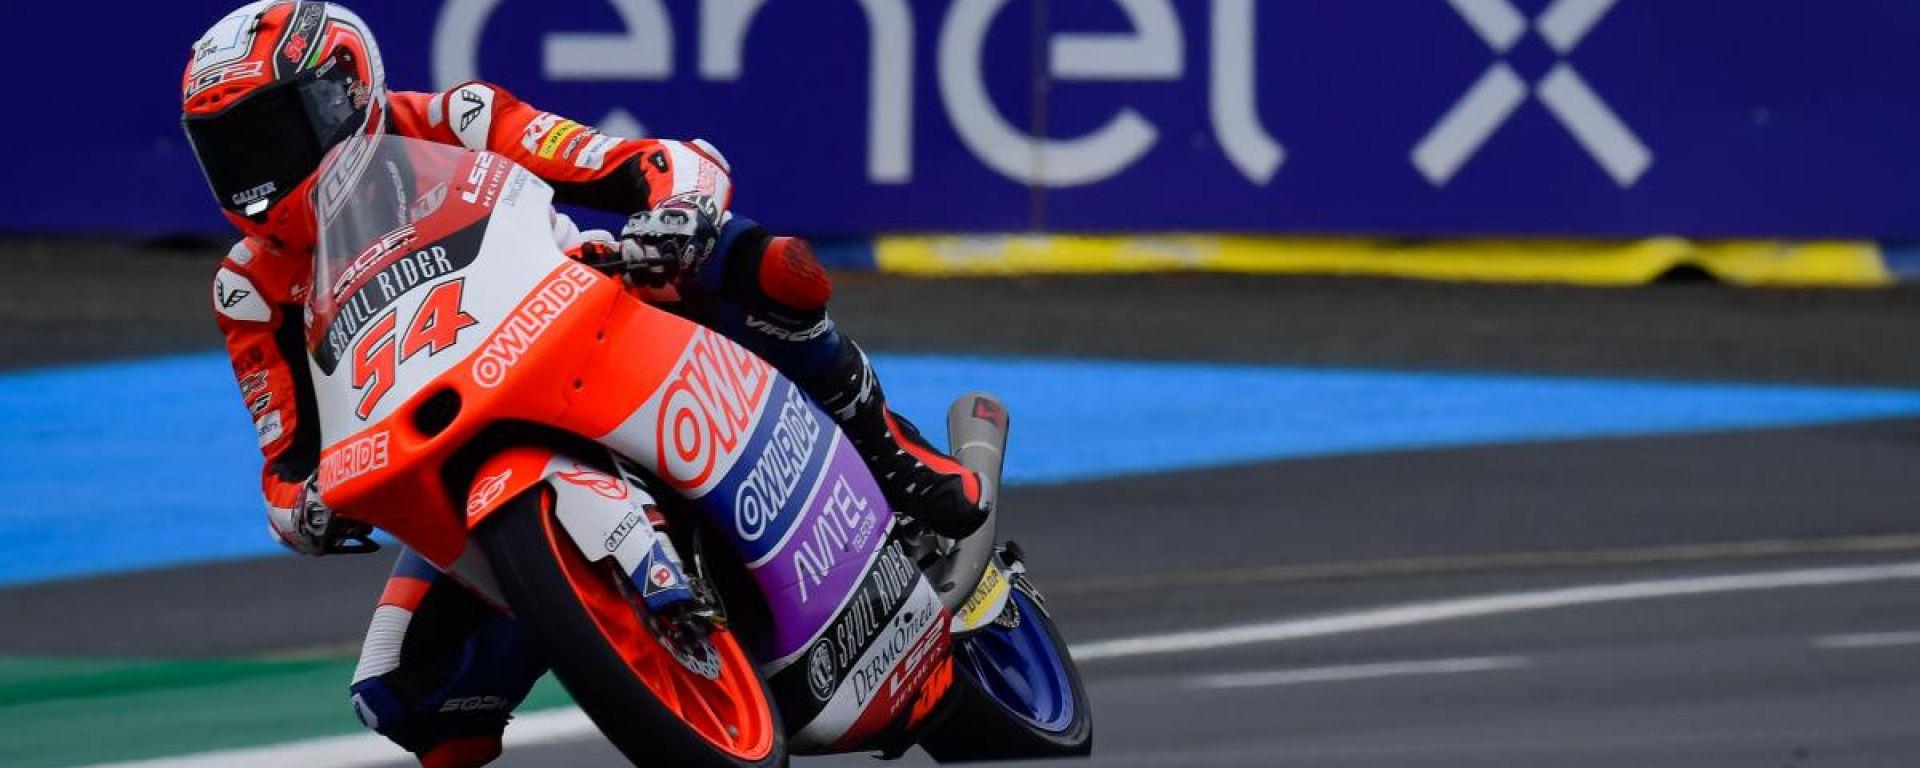 Moto3 Francia 2021, Le Mans: Riccardo Rossi (KTM)